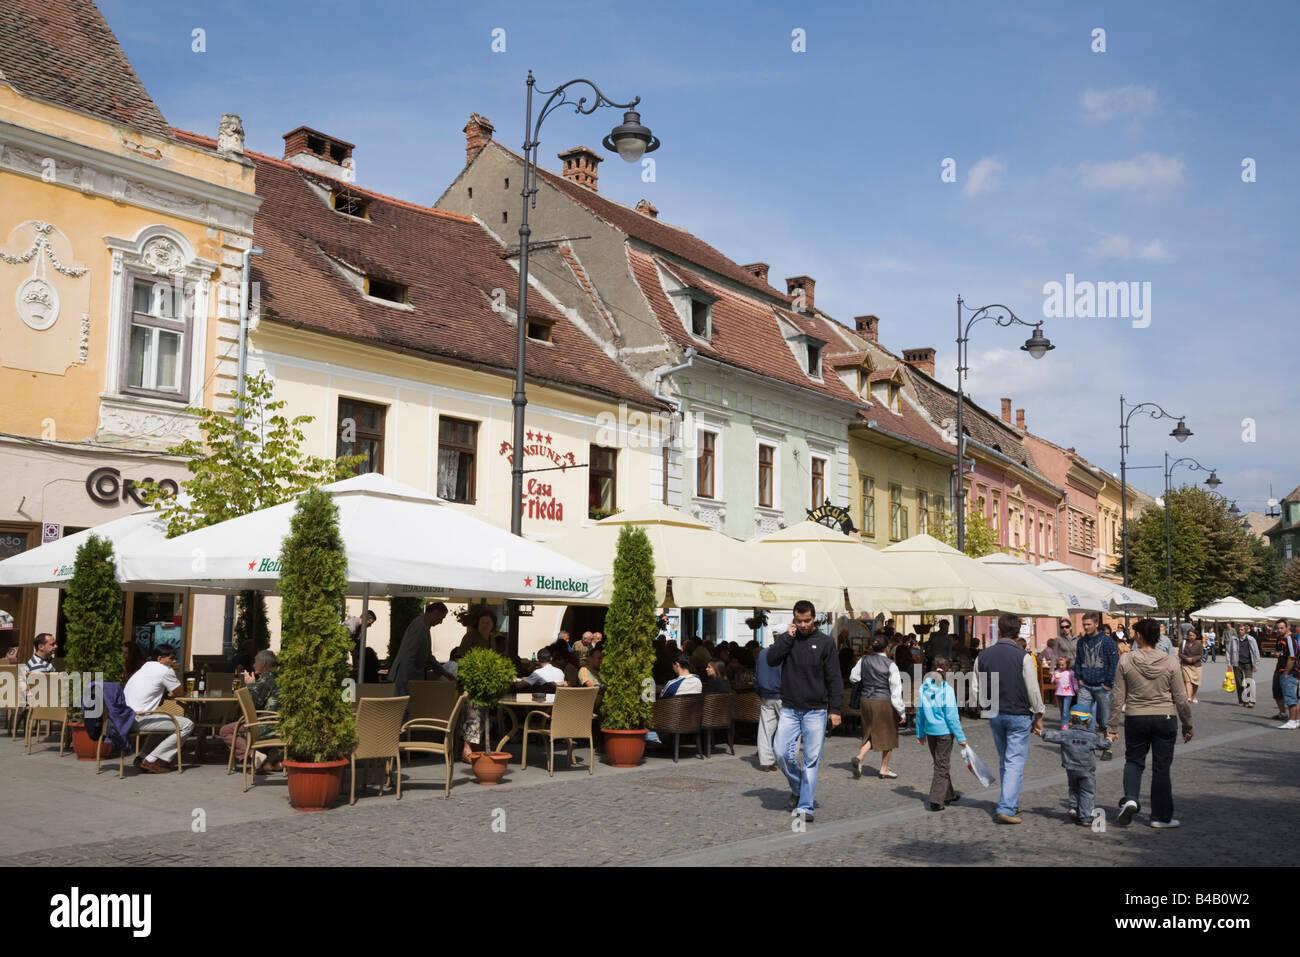 Sibiu Transylvania Romania Street cafes with umbrellas and outdoor seating on pedestrian precinct in historic city - Stock Image